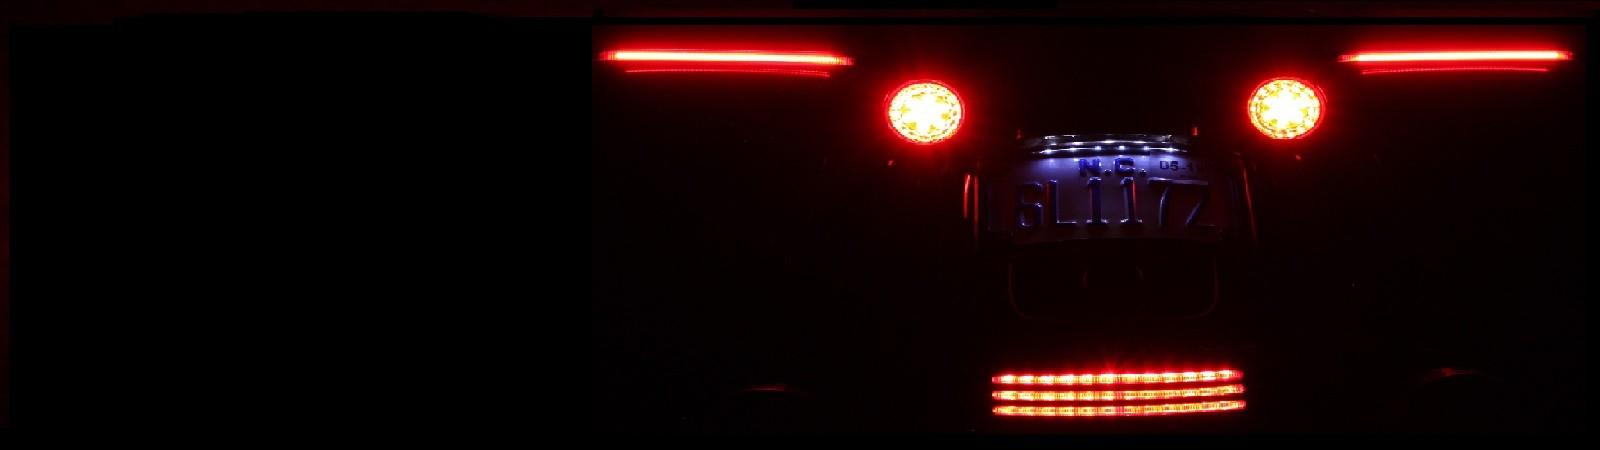 Custom Dynamics Motorcycle LED Lighting